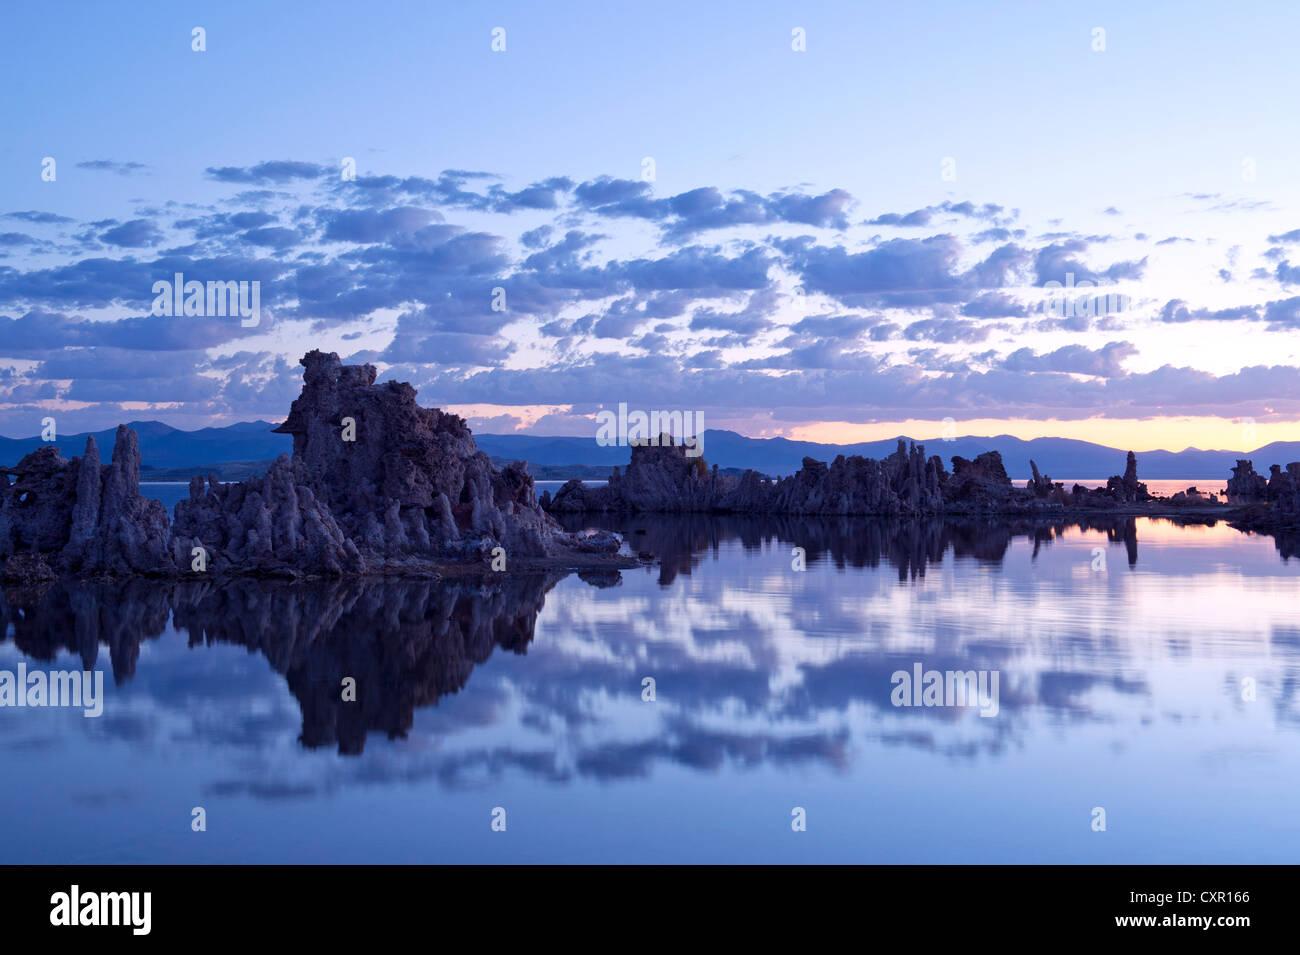 Tufa rock formation, mono lake, california, usa - Stock Image